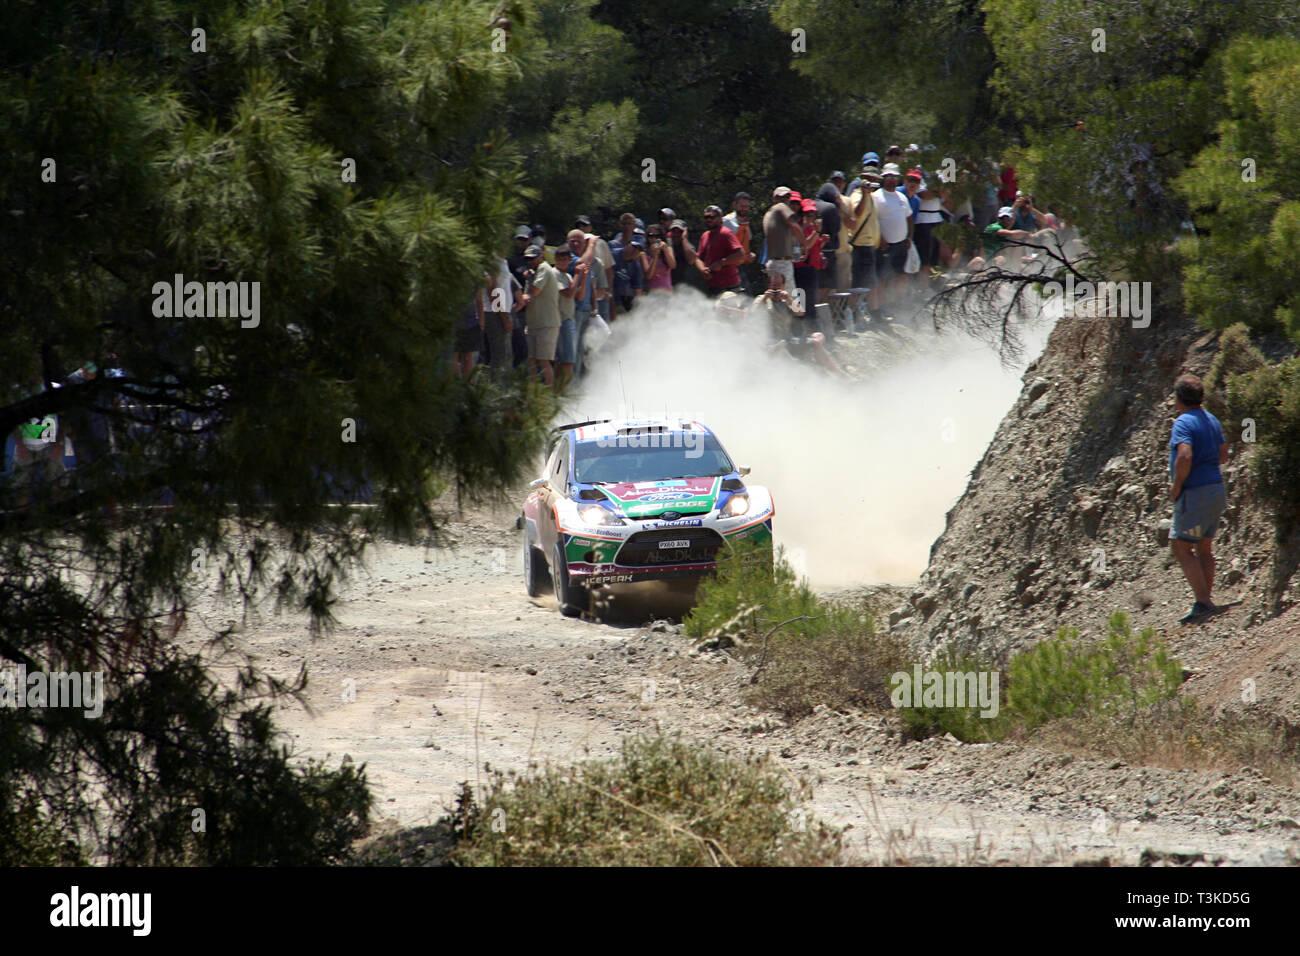 2011 Acropolis Rally, Special Stage 16 (Aghii Theodori 2). Jari-Matti Latvala - Miikka Anttila, Ford Fiesta RS WRC (finished 9th) - Stock Image